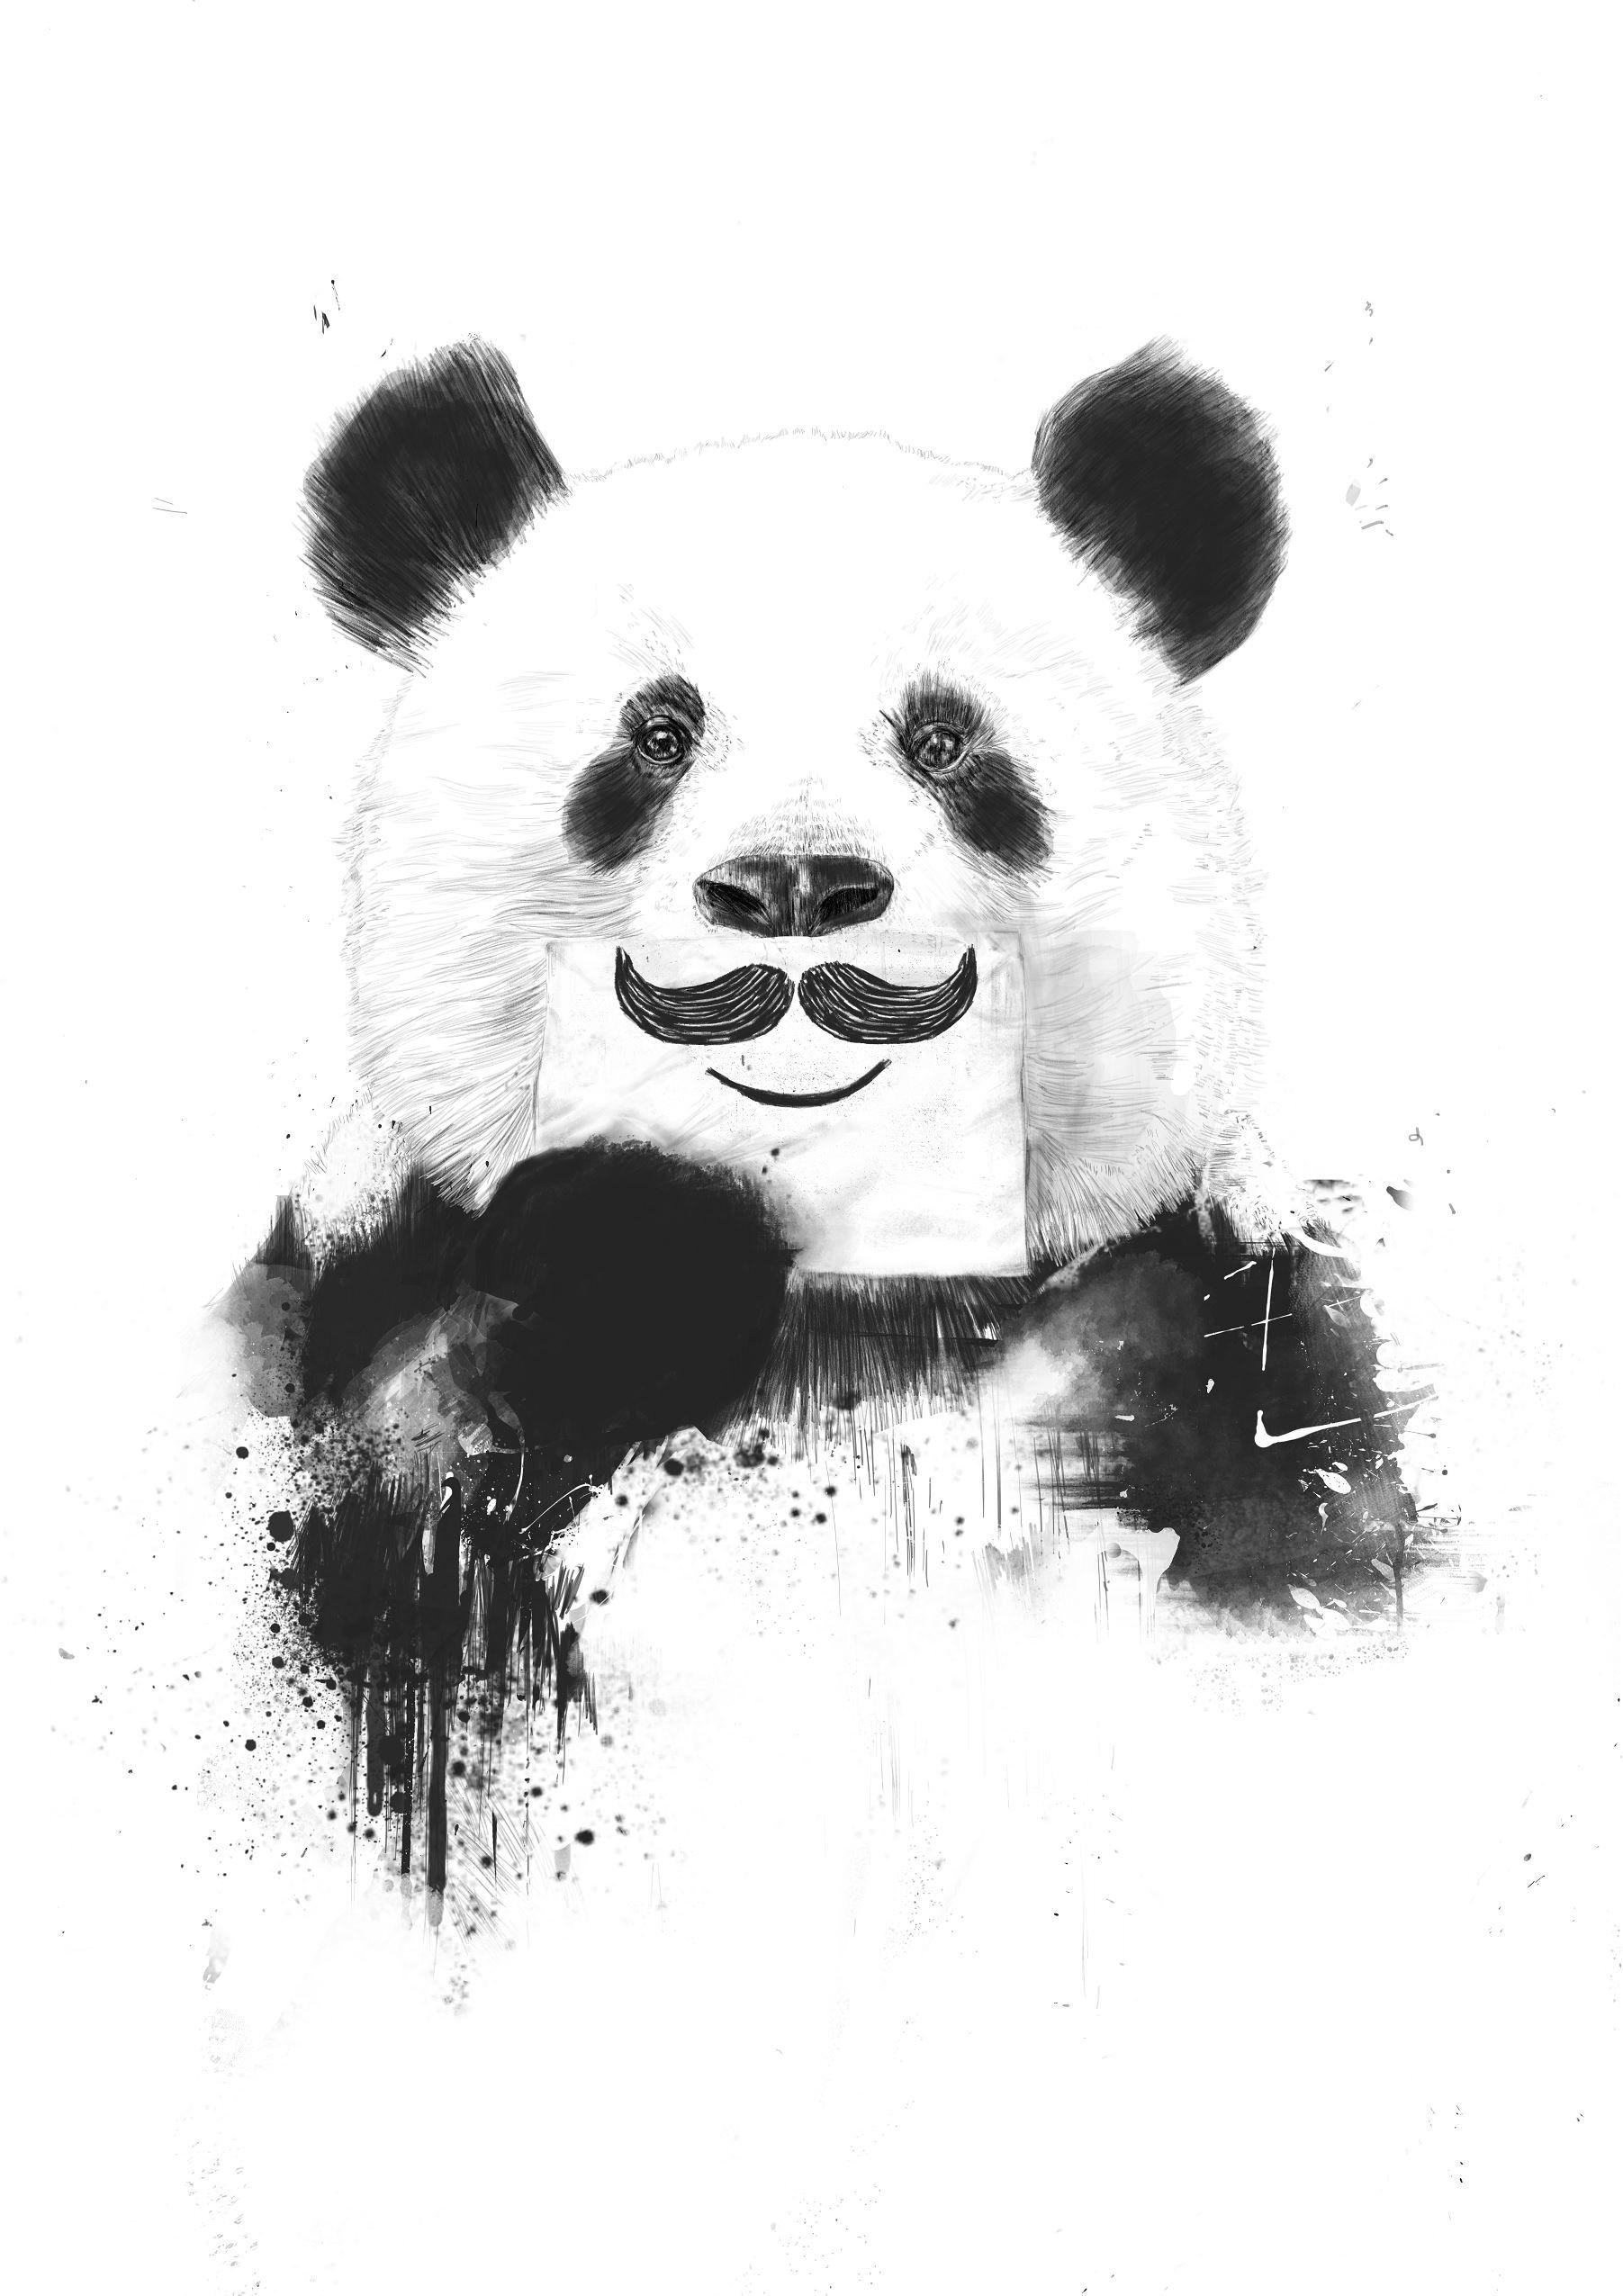 Balazs Solti - Funny Panda